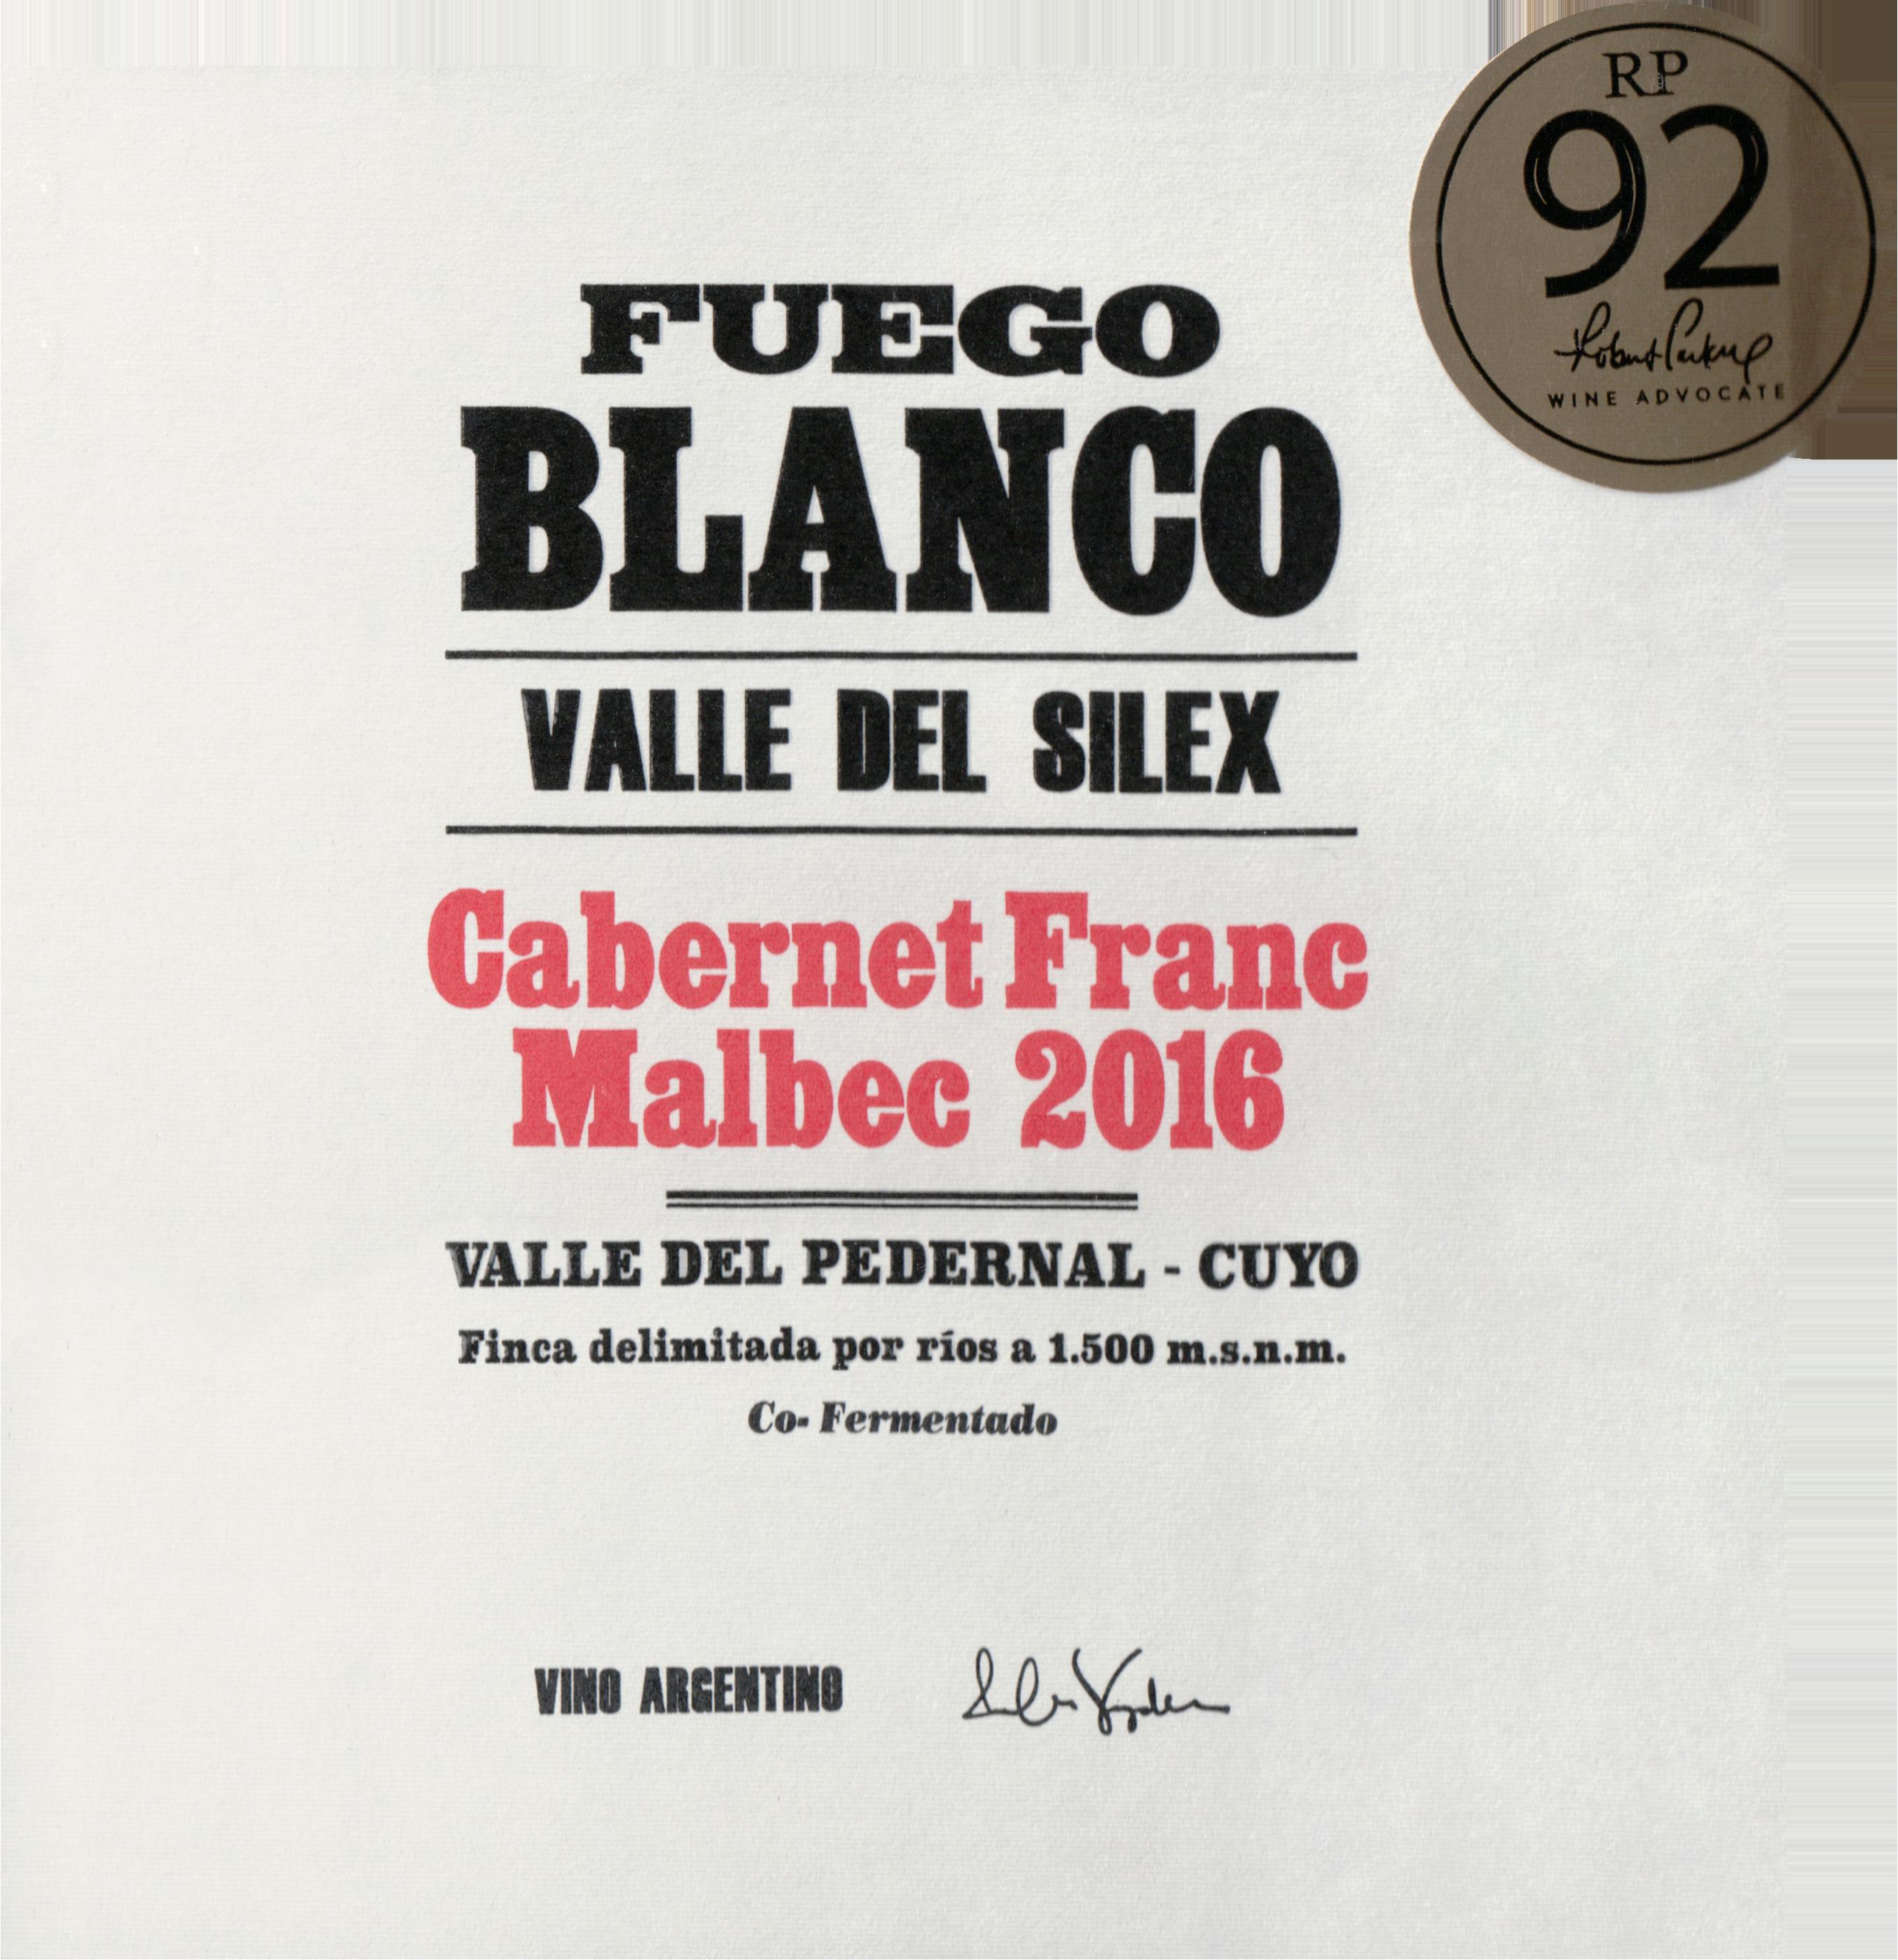 Fuego Blanco Cabernet Franc Malbec 2016